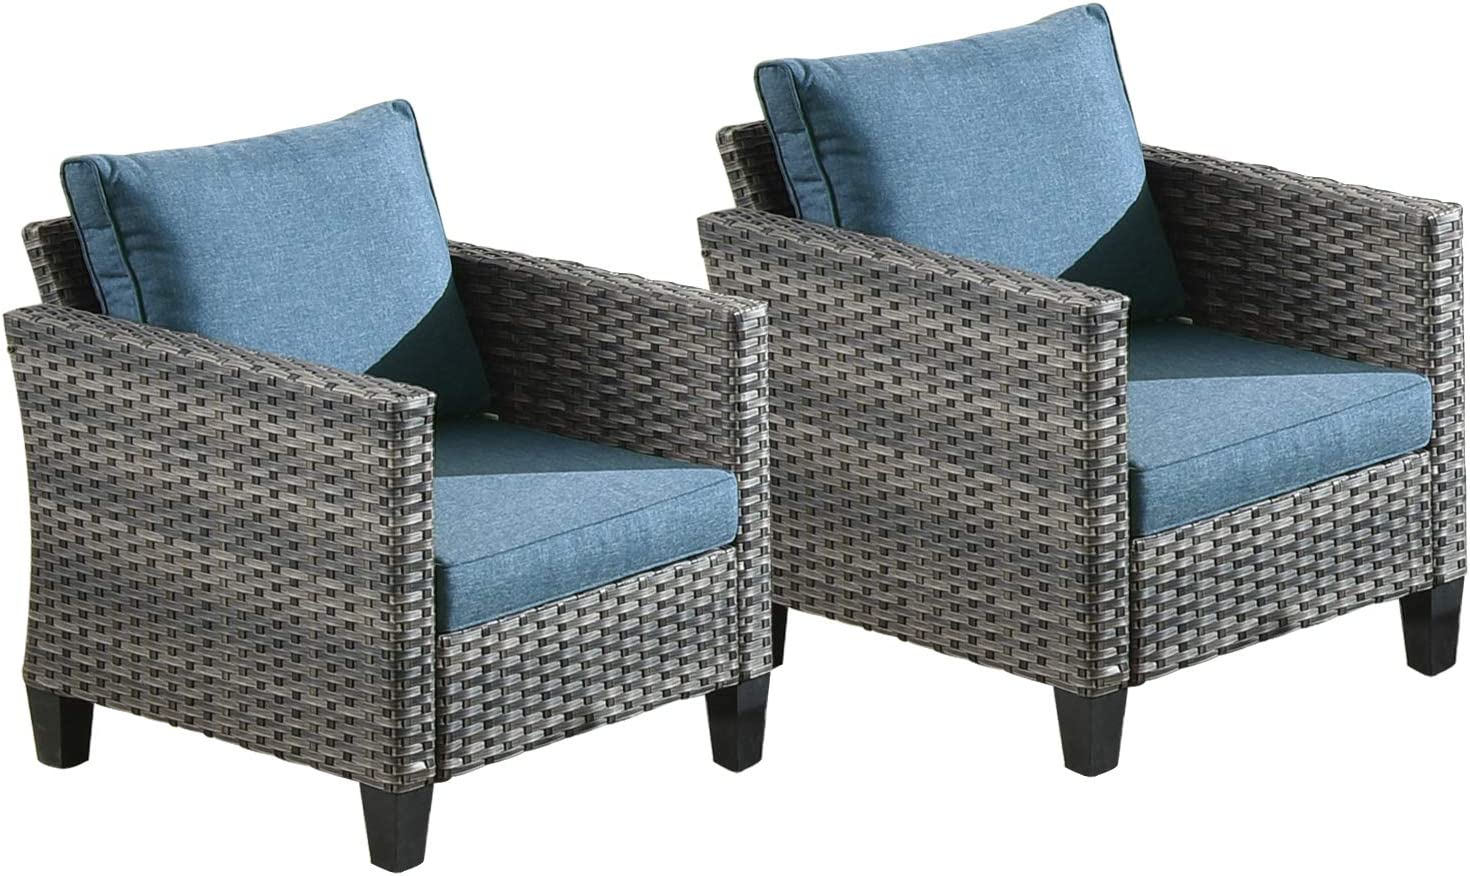 Ovios Patio Furniture Direct store shipfree Sets 2 PCS Chai Wicker Rattan Porch Chairs